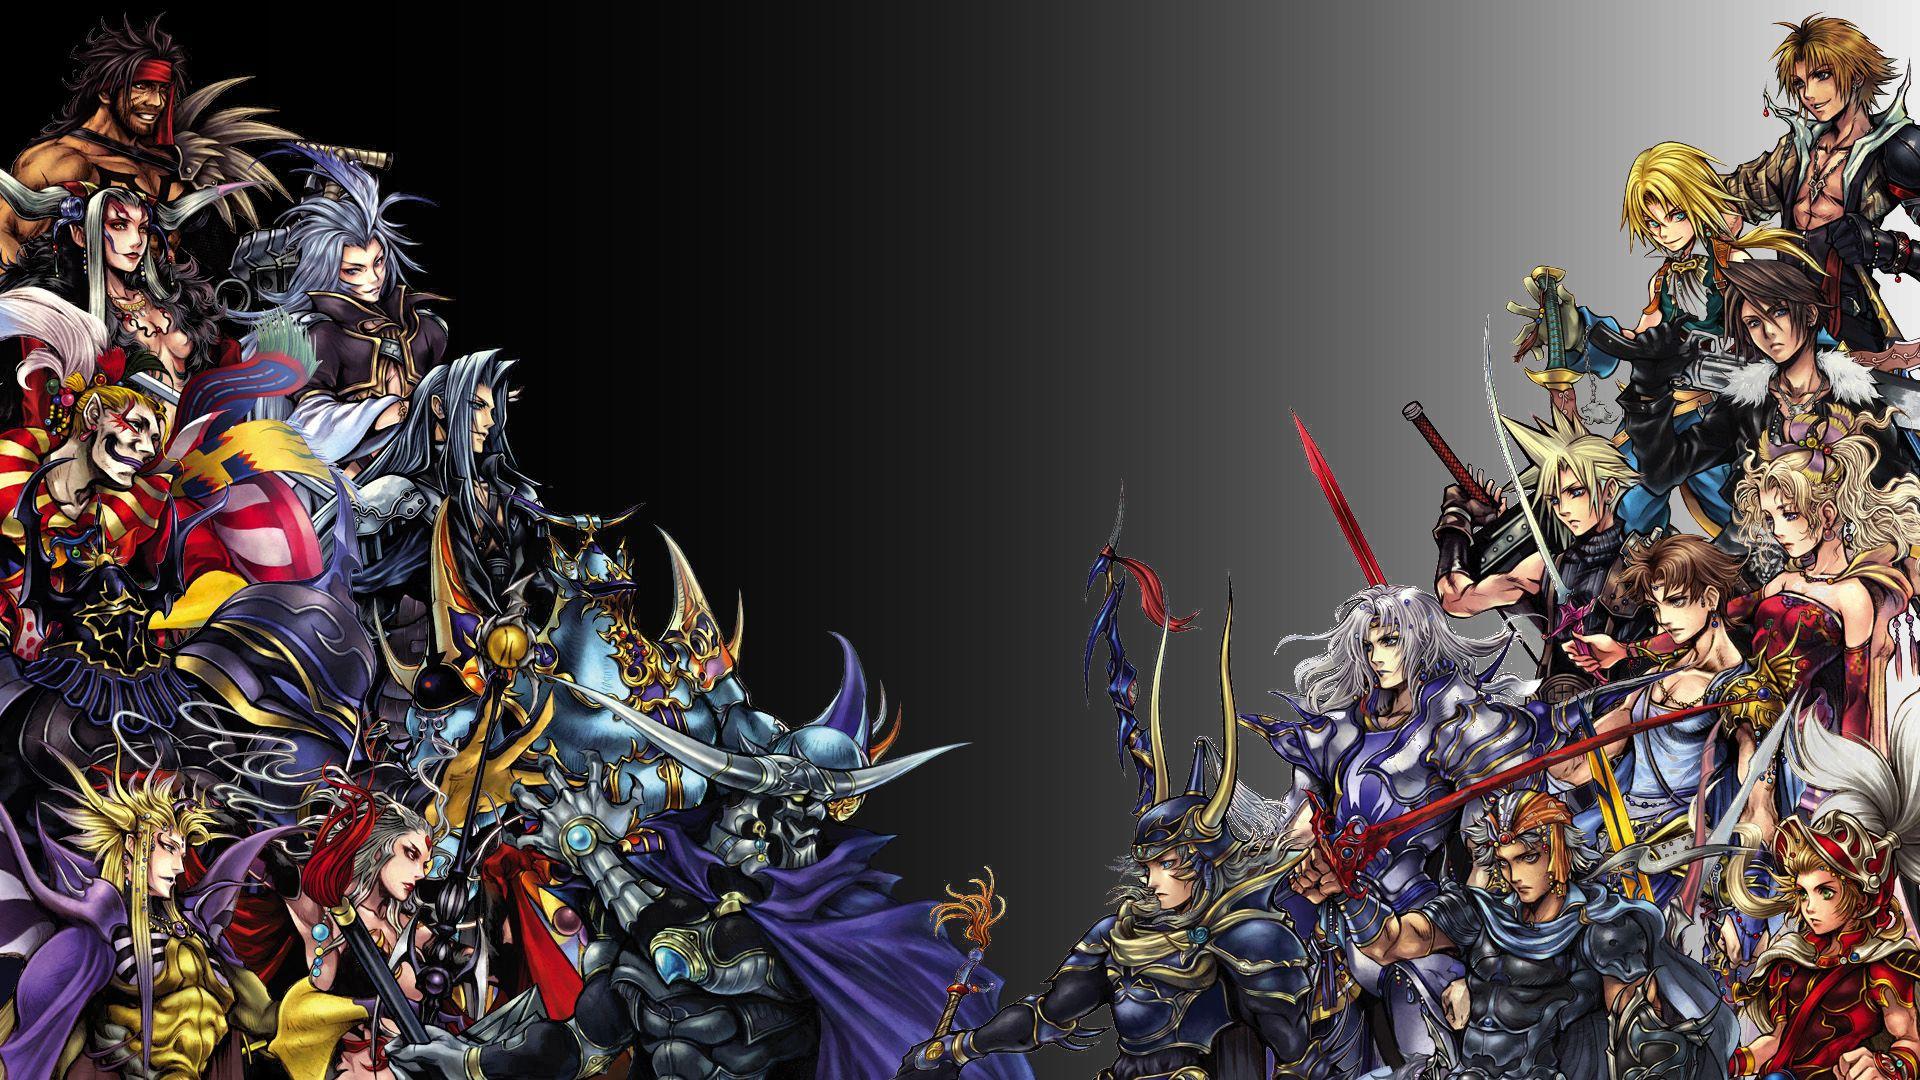 Final Fantasy Good Vs Evil Final Fantasy Cloud Strife Lightning Final Fantasy Final Fantasy Cloud Final fantasy full hd desktop wallpapers